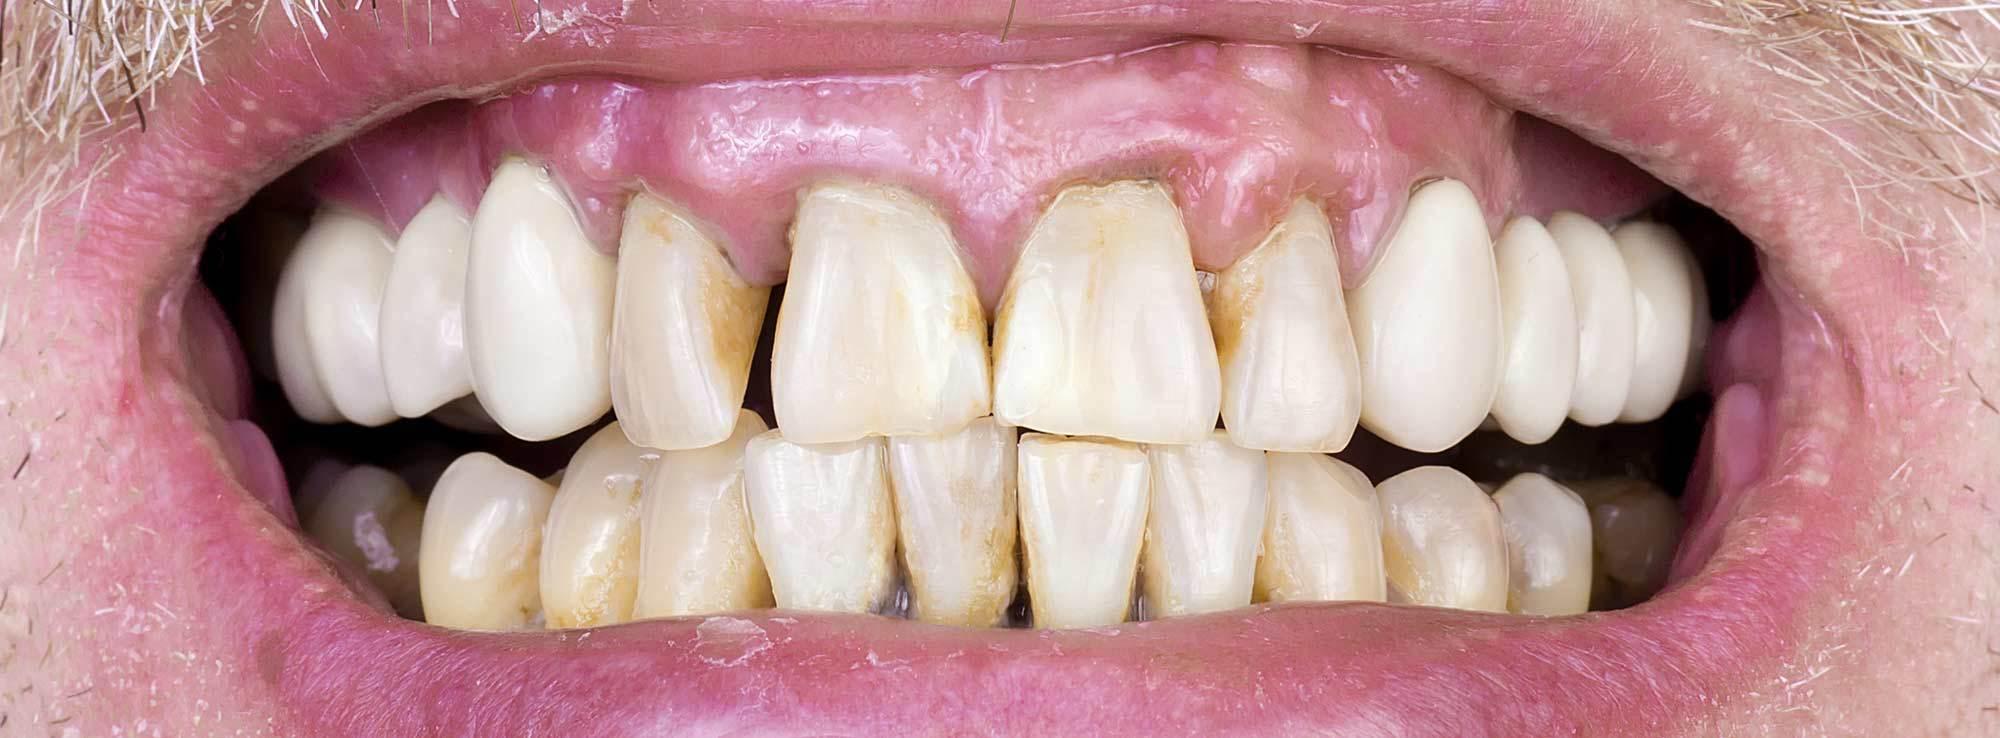 Receding Gum Treatment by Nassau County Periodontist Dr. Marichia Attalla